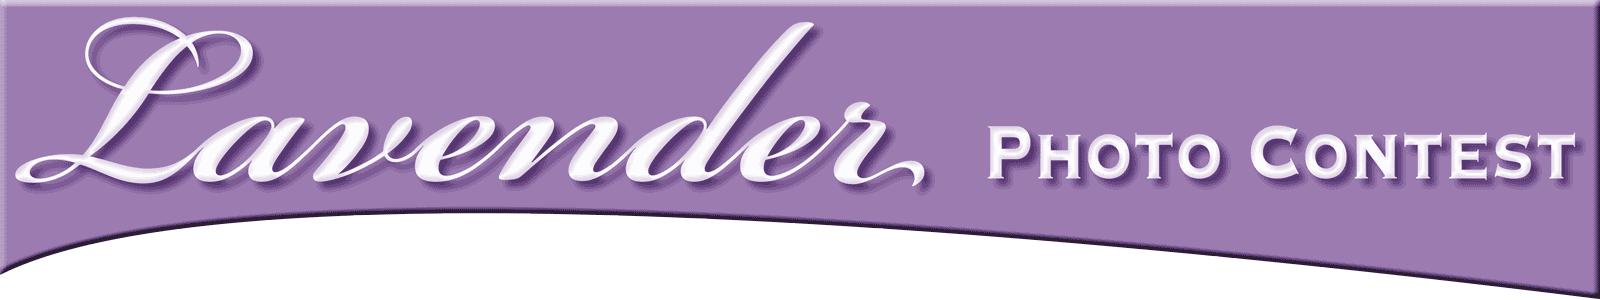 Lavender Photo Contest